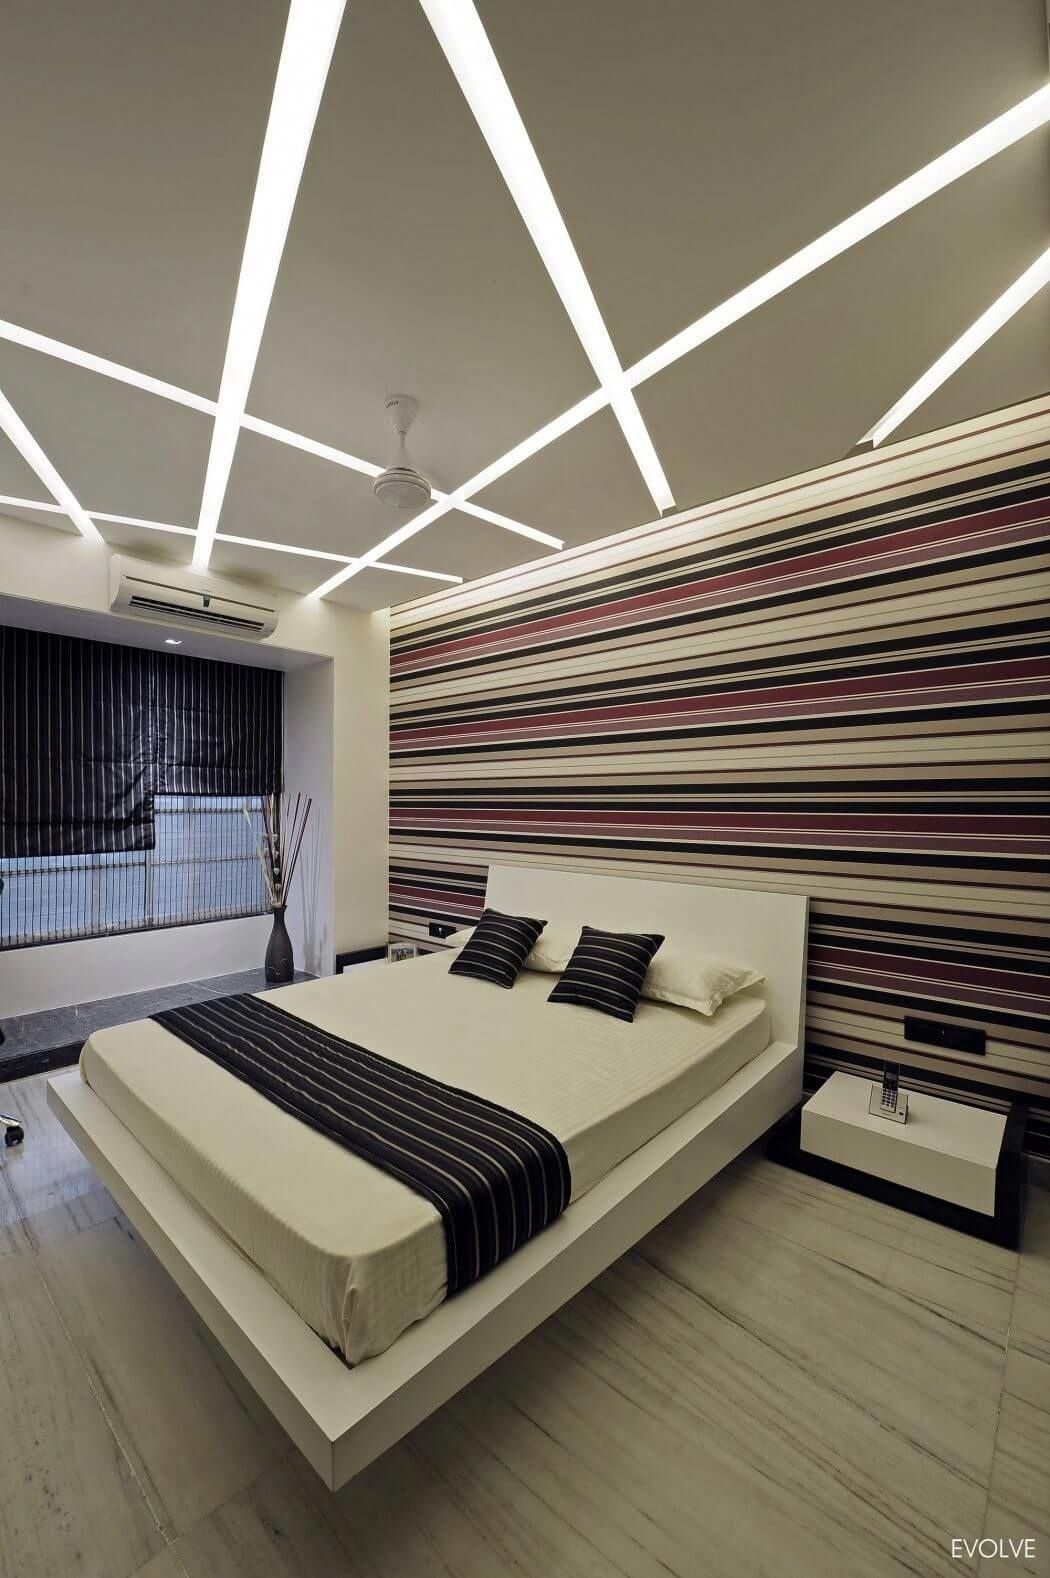 21 Best Wonderful Design Ceiling Design Ideass For You Bedroom False Ceiling Design False Ceiling Bedroom Ceiling Design Living Room